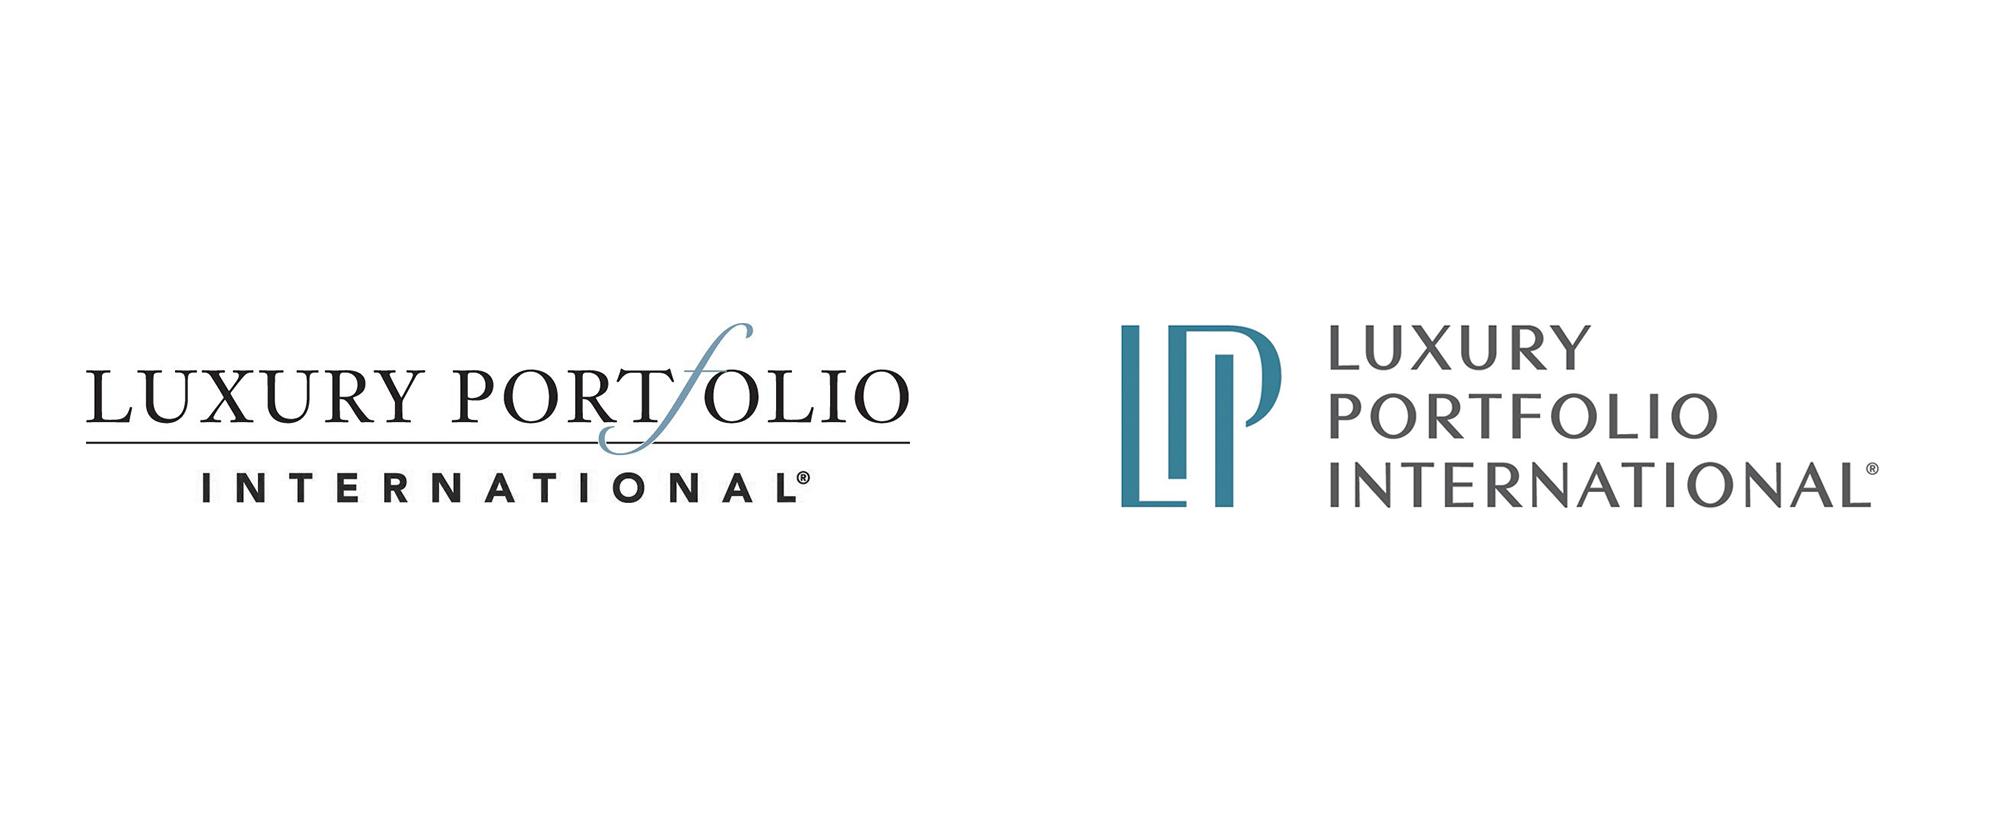 New Logo for Luxury Portfolio International by 1000watt